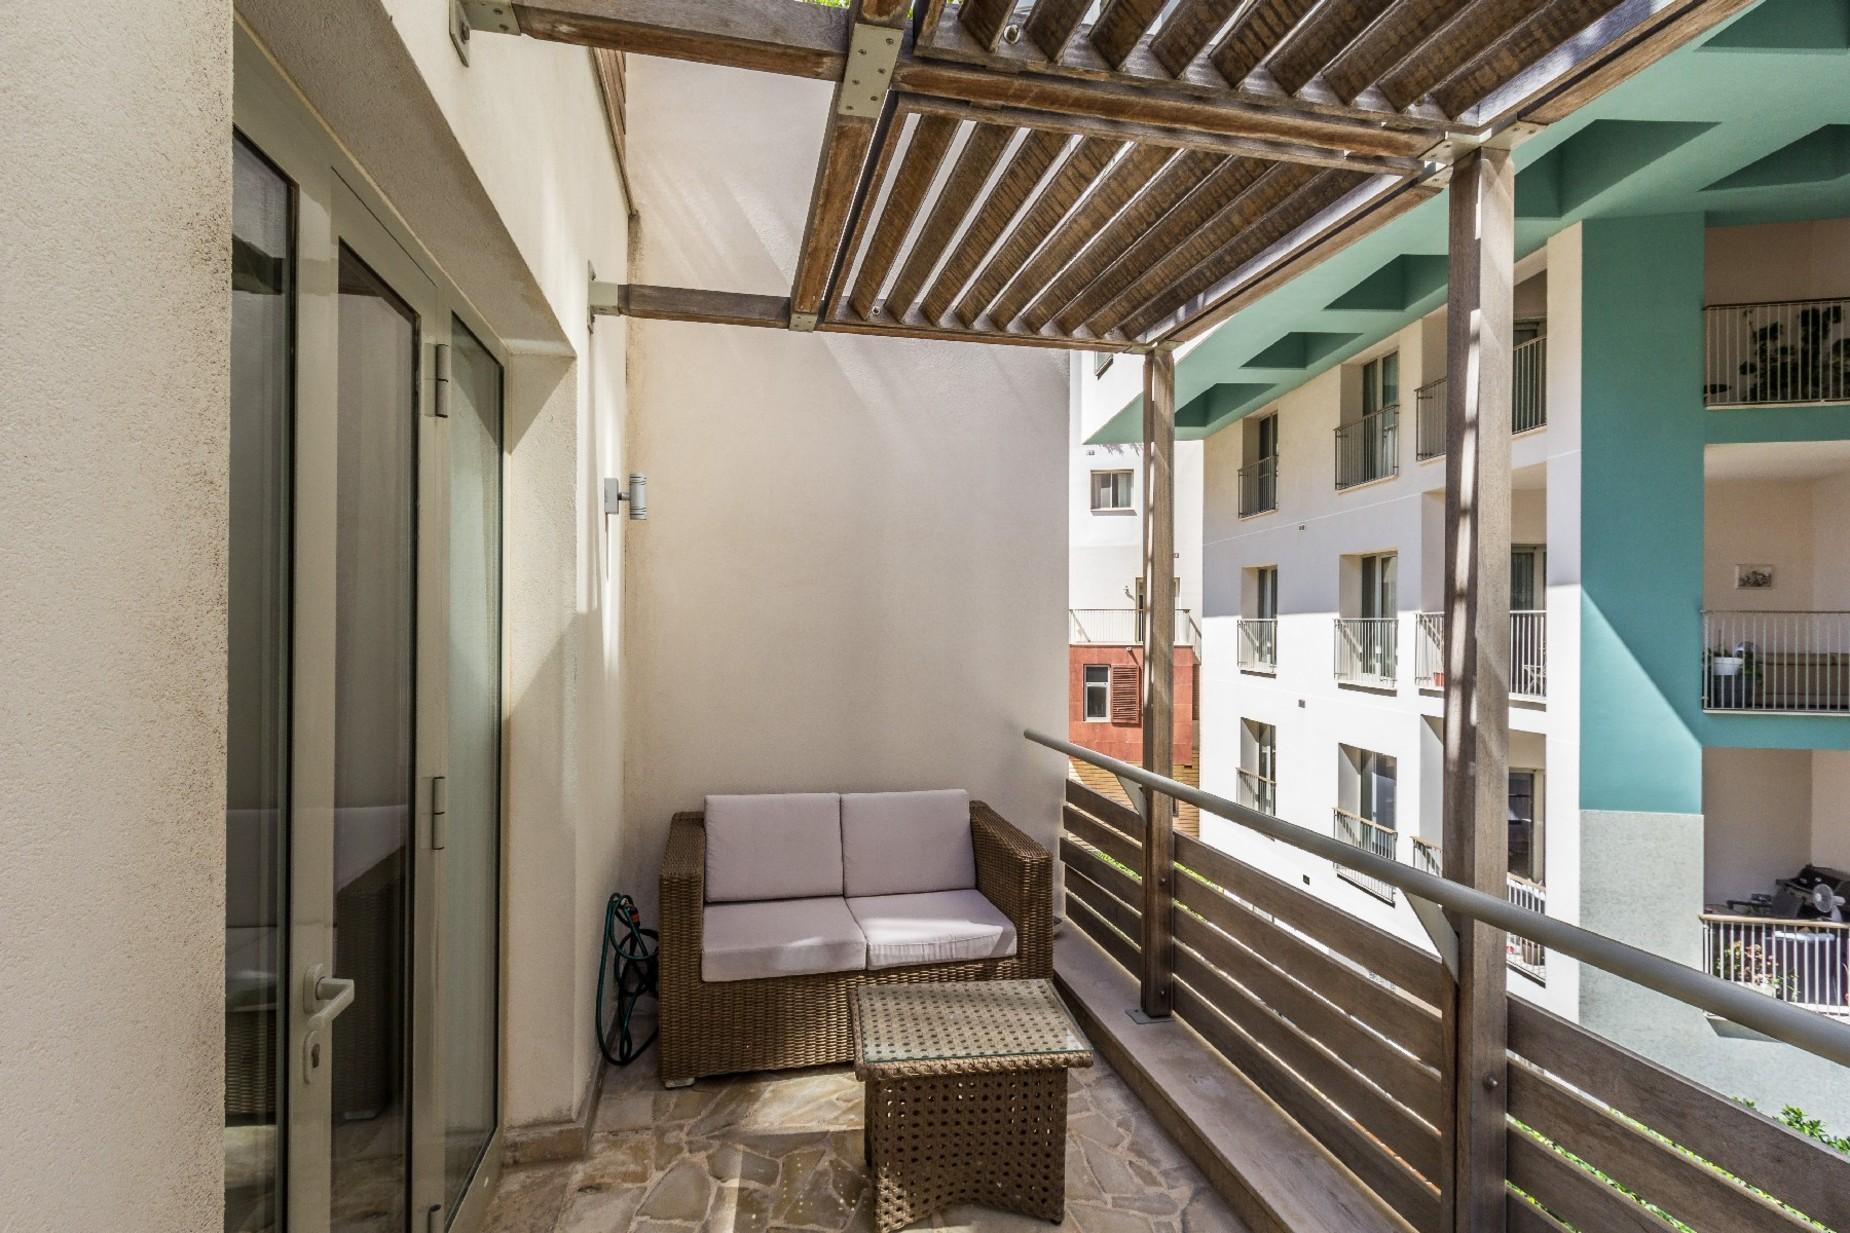 4 bed Apartment For Rent in Sliema, Sliema - thumb 15